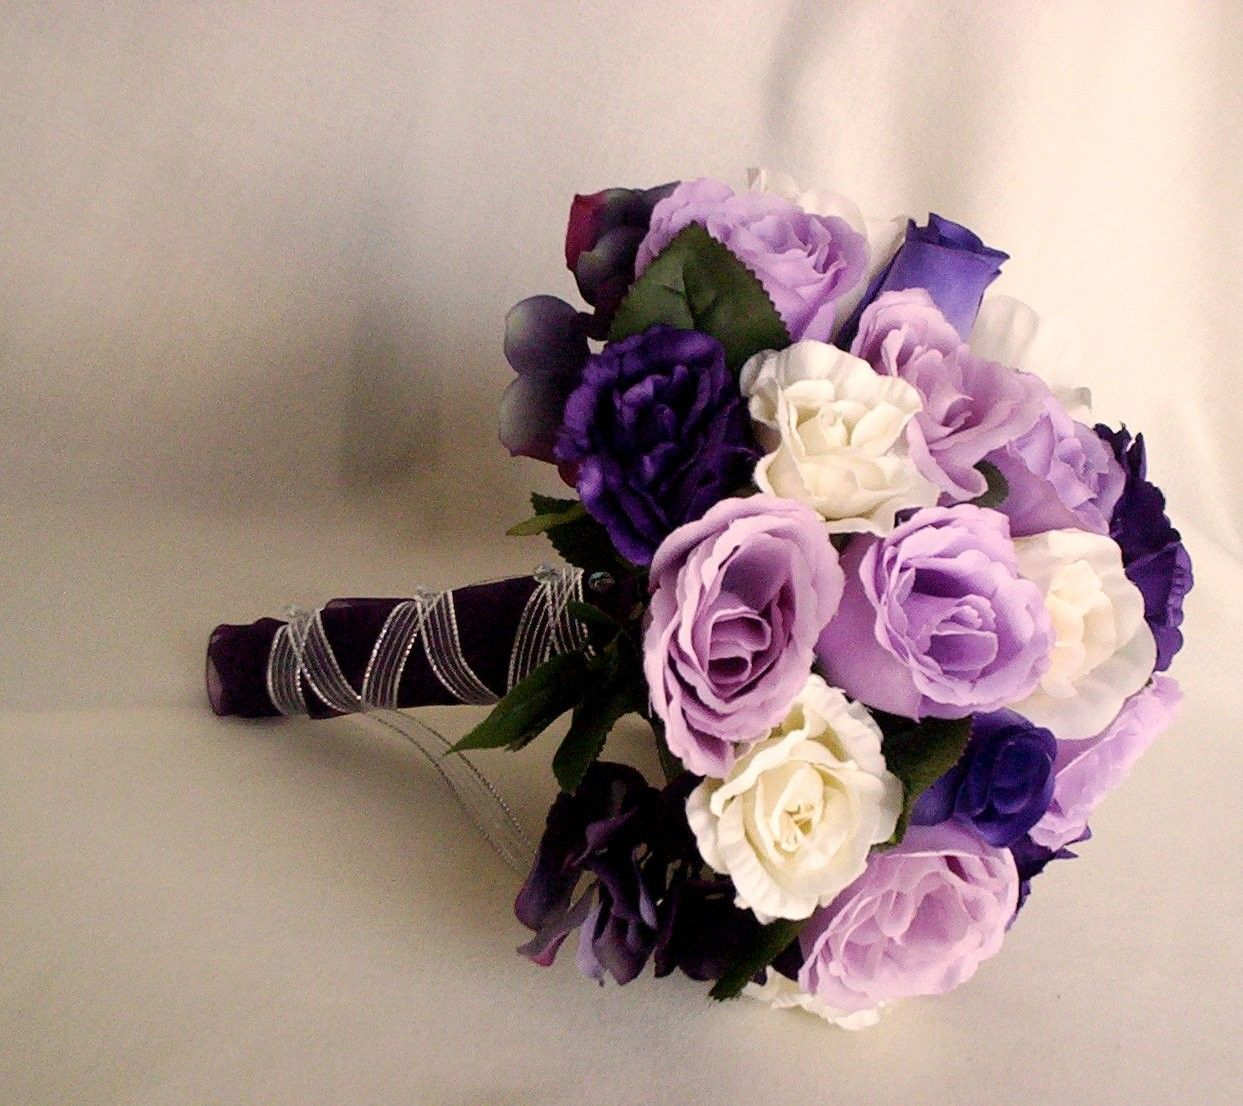 Bride Bouquet Wedding Flowers Purple Lavender silk Rose spring Bridal Bouquet Winter accessory